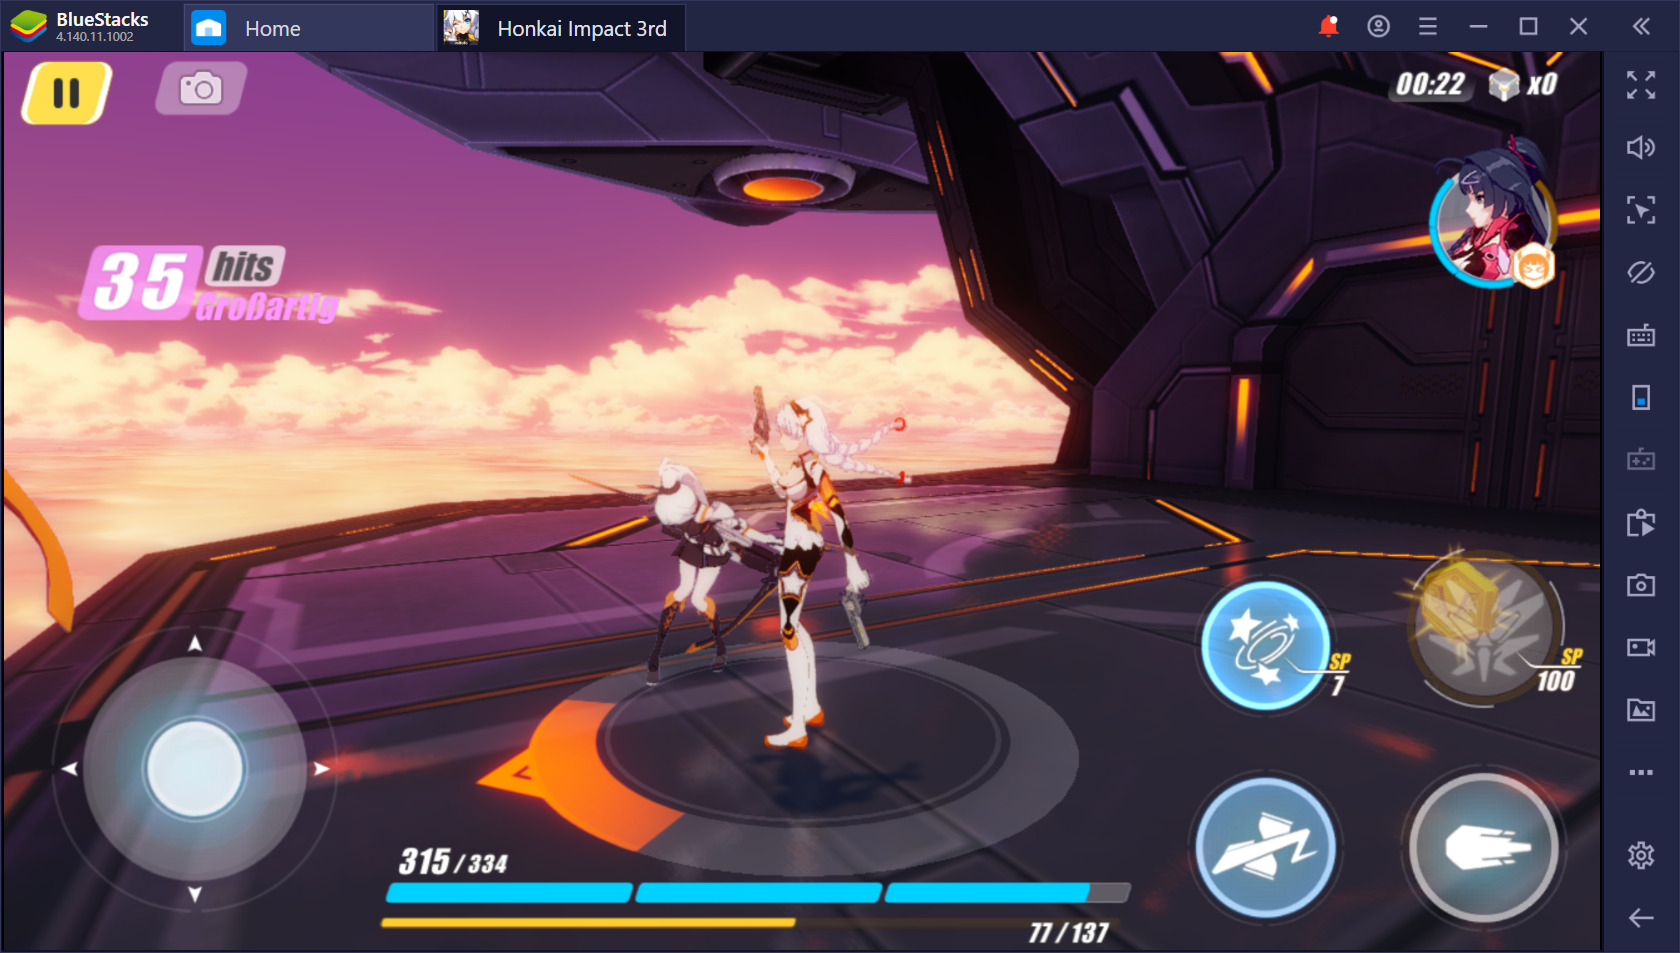 Kampftaktiken für Honkai Impact 3rd